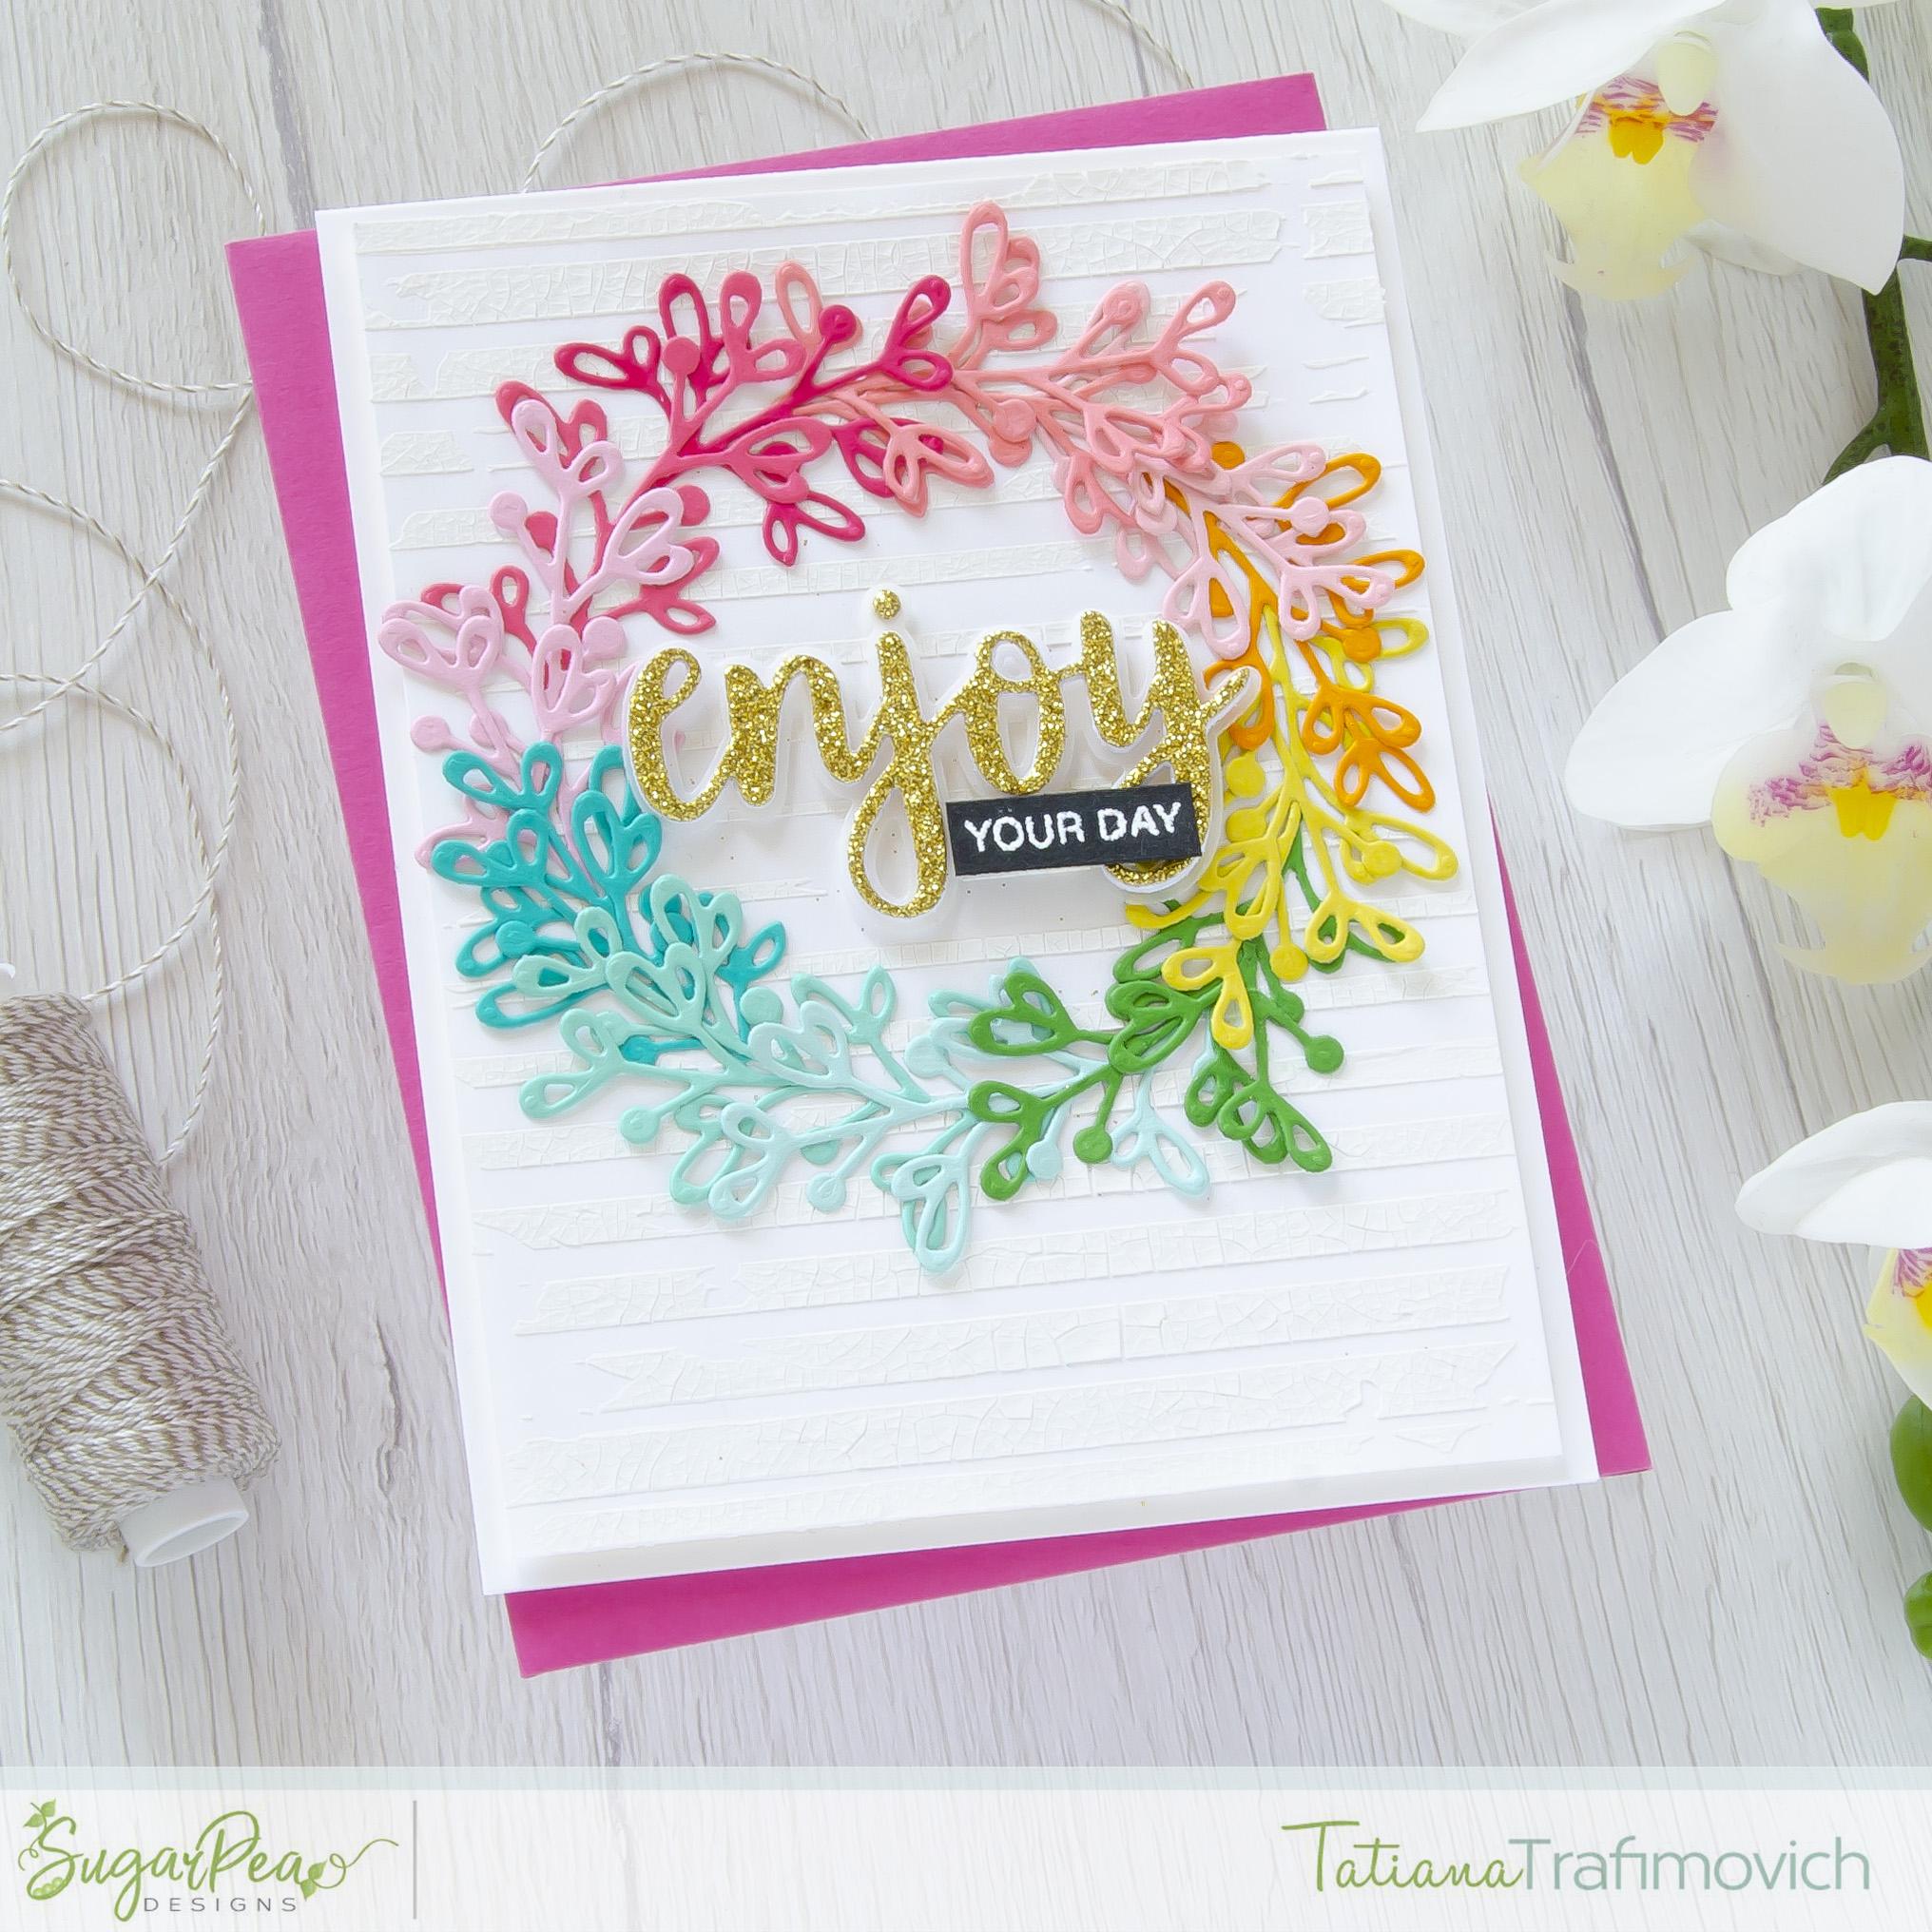 Enjoy Your Day #handmade card by Tatiana Trafimovich #tatianacraftandart - Botanical Brunches Die by SugarPea Designs #sugarpeadesigns